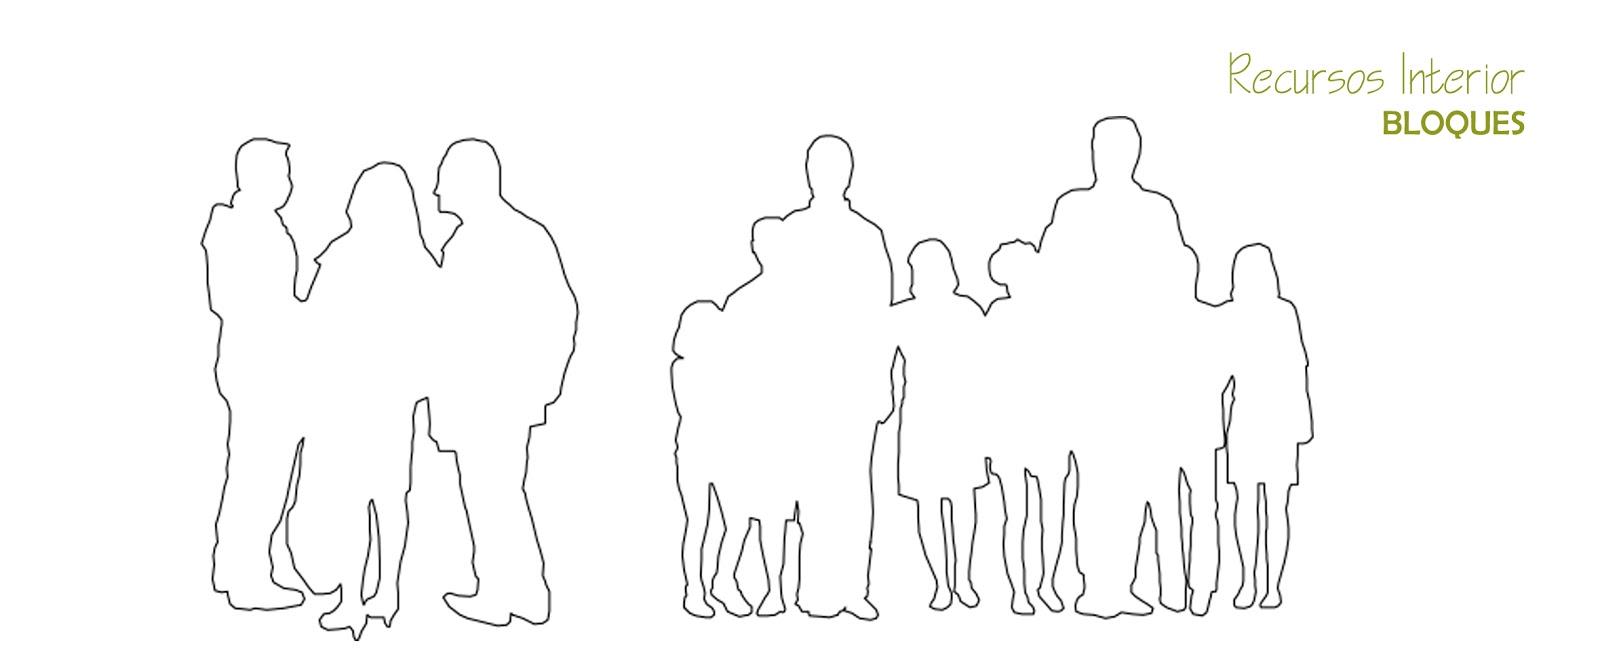 5 bloques gratis dwg silueta de grupos archivo 5 for Arquitectura en linea gratis